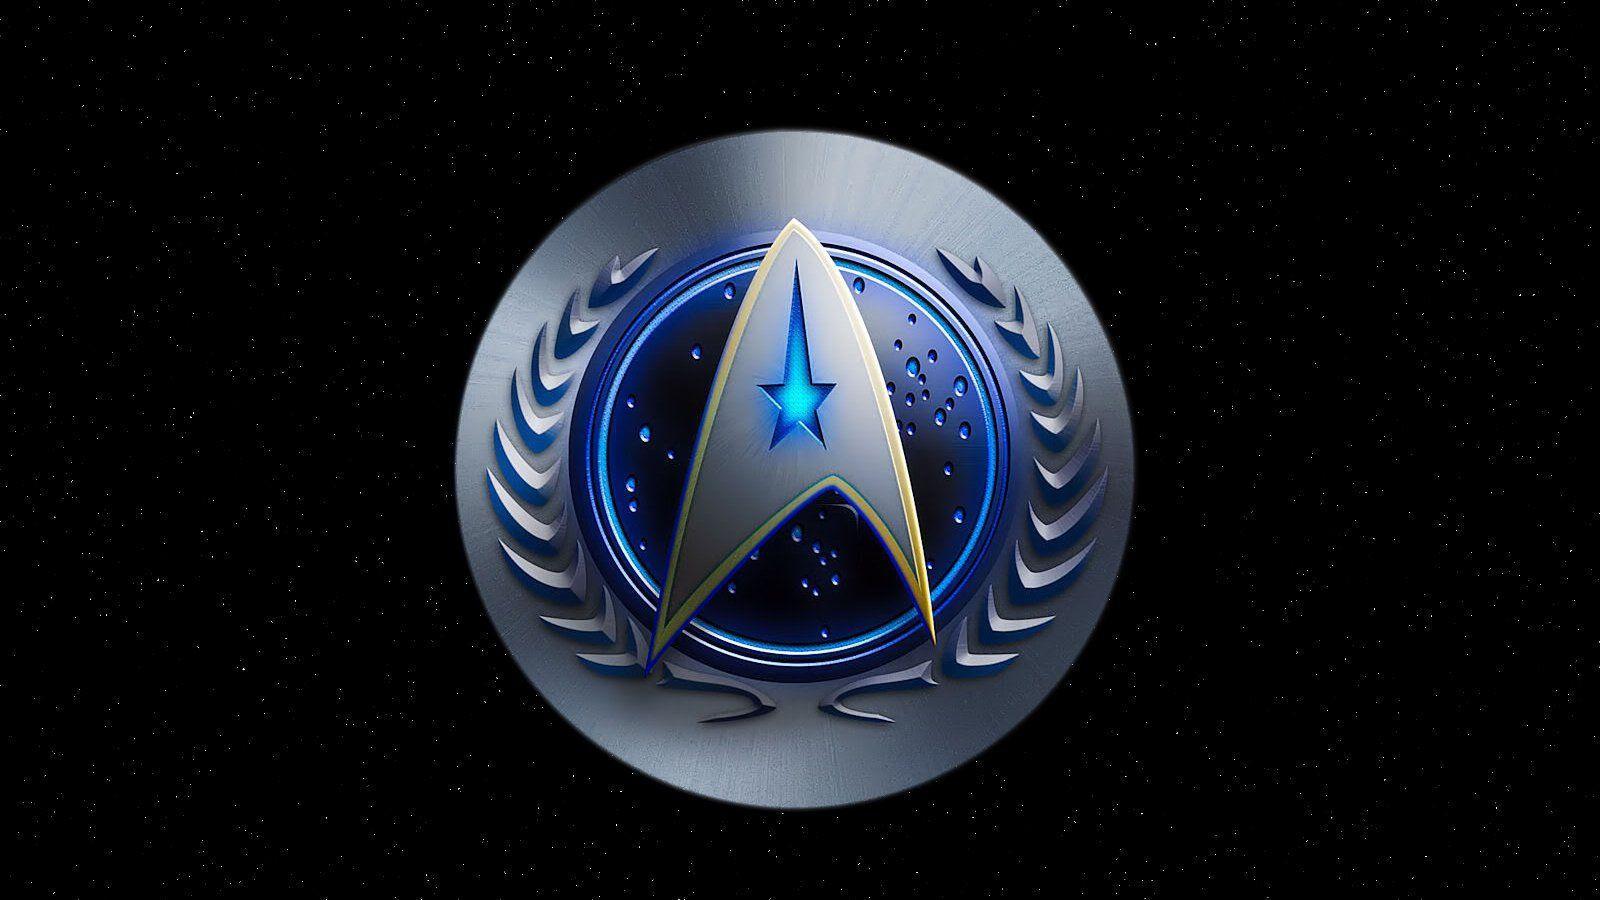 Star Trek Wallpapers Tablet Wallpaper Cave